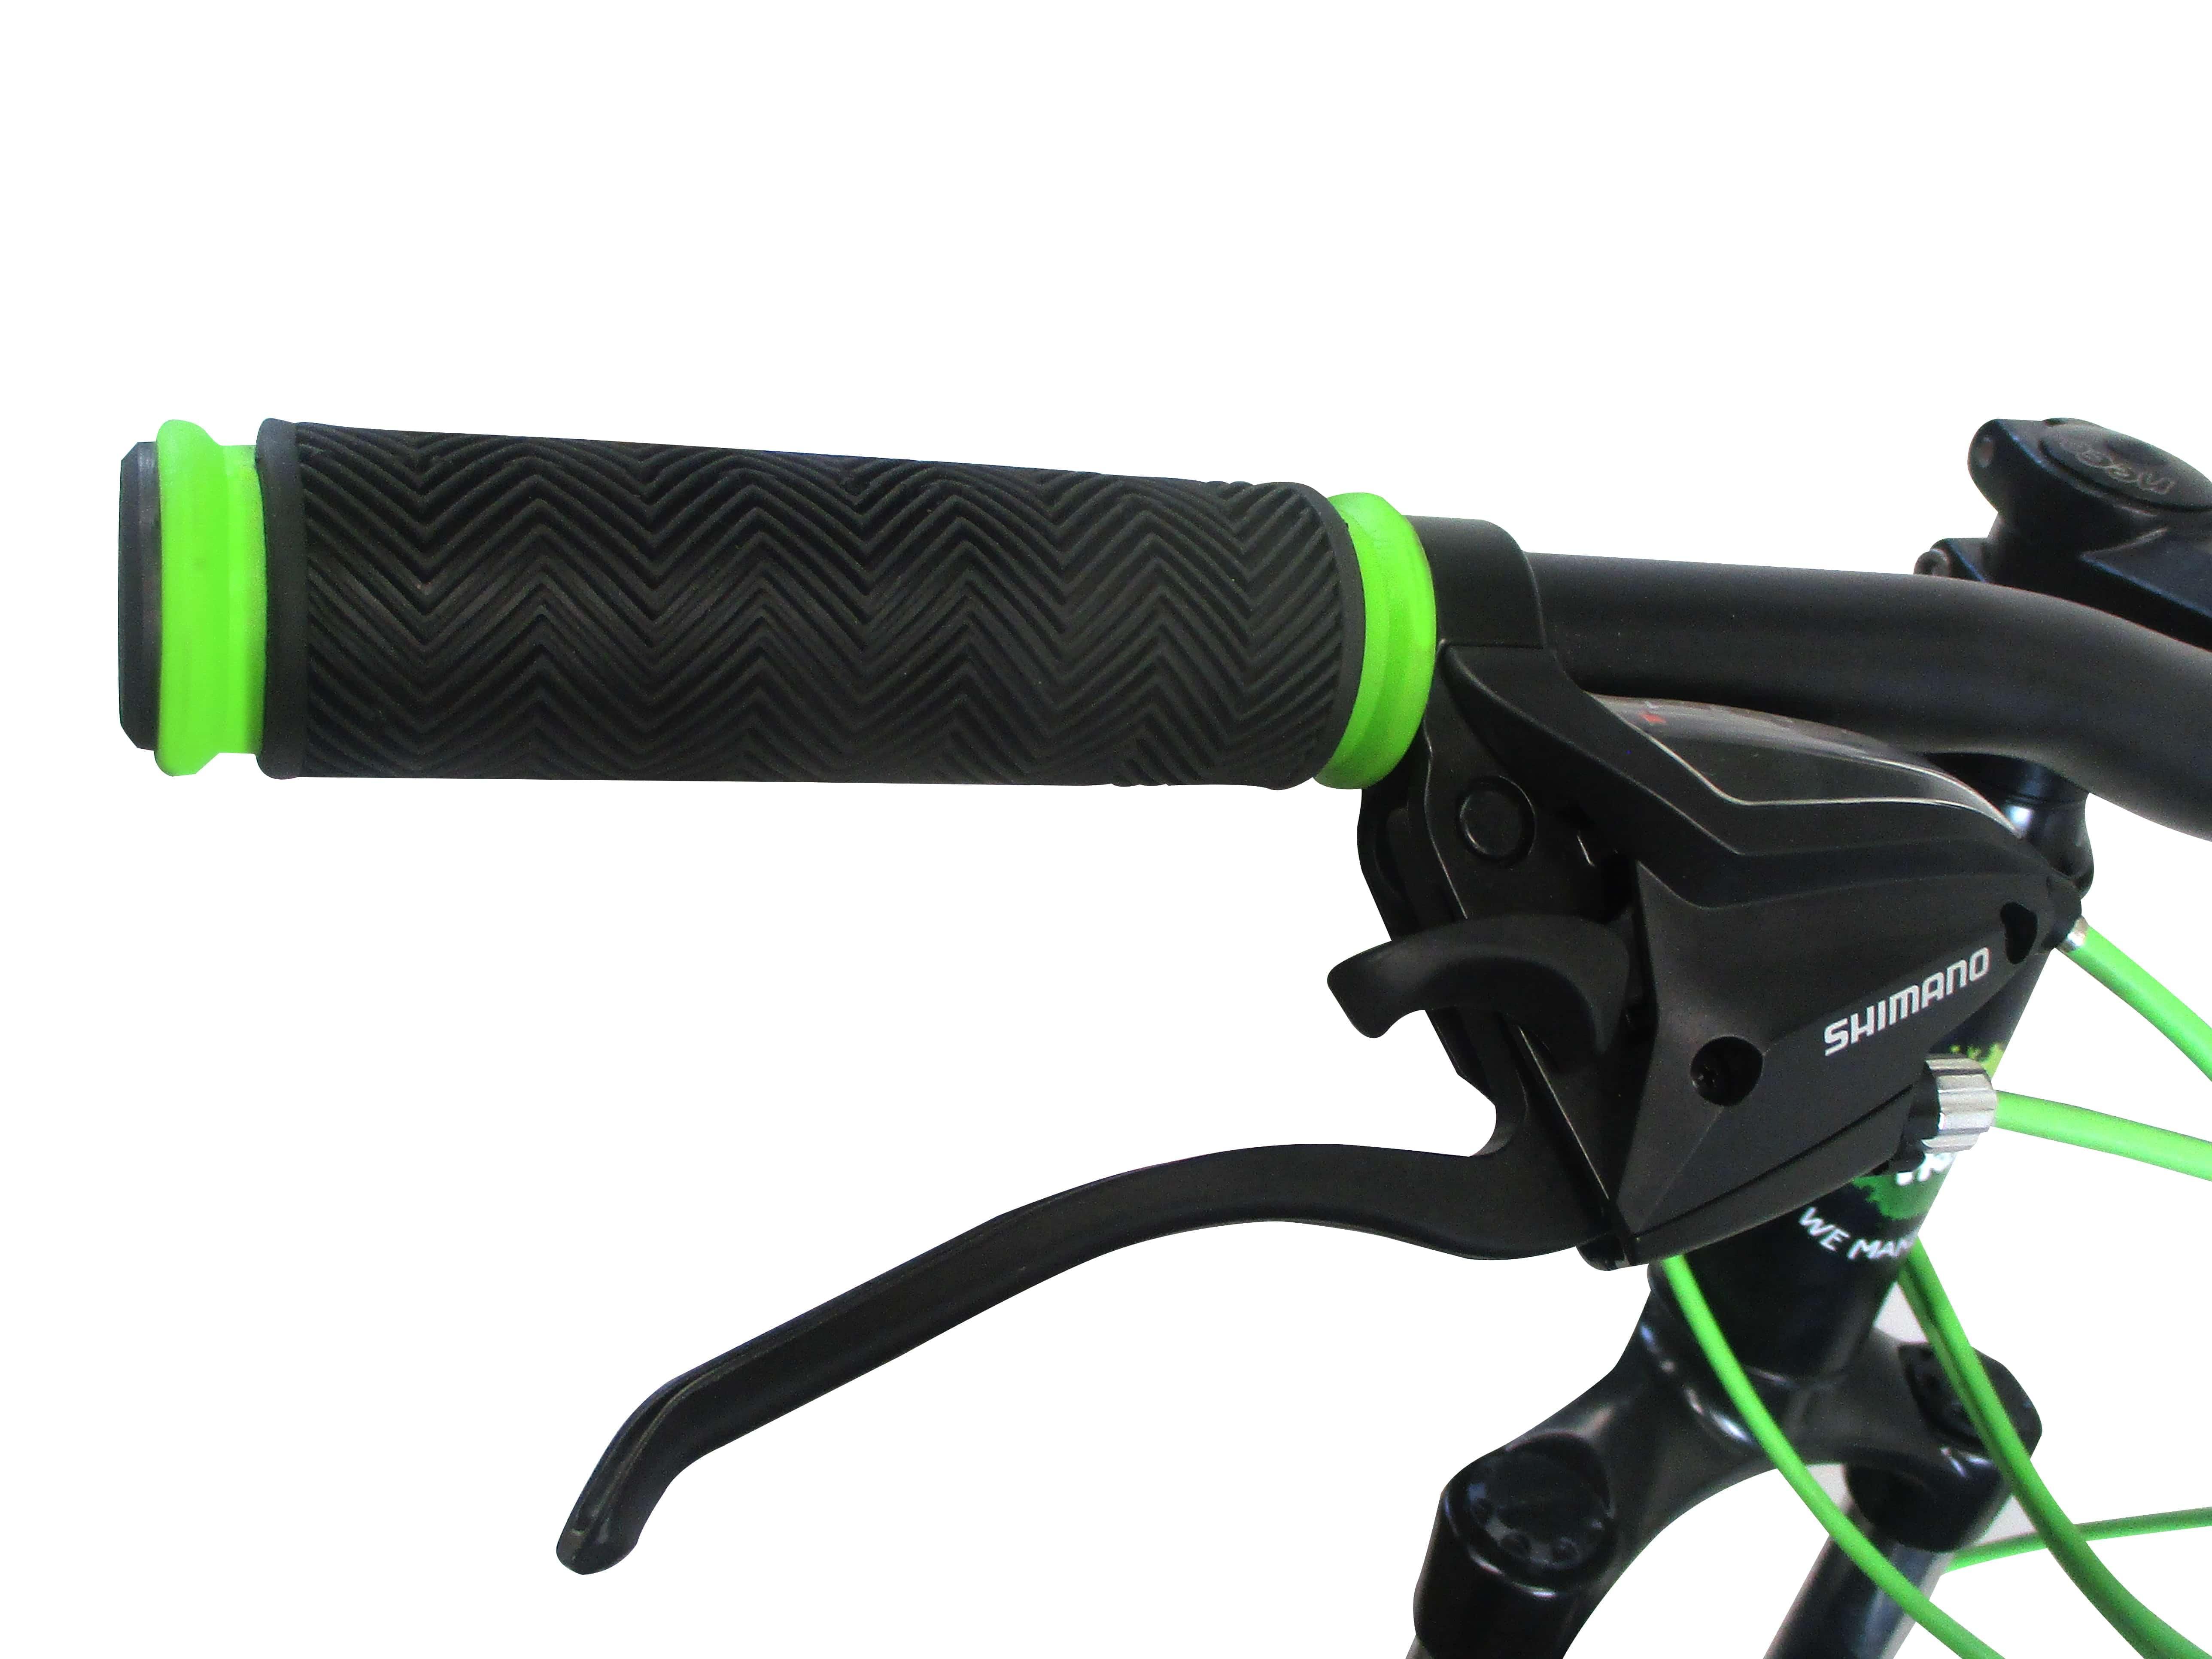 Viper X 101 27 5 Black Green image 5